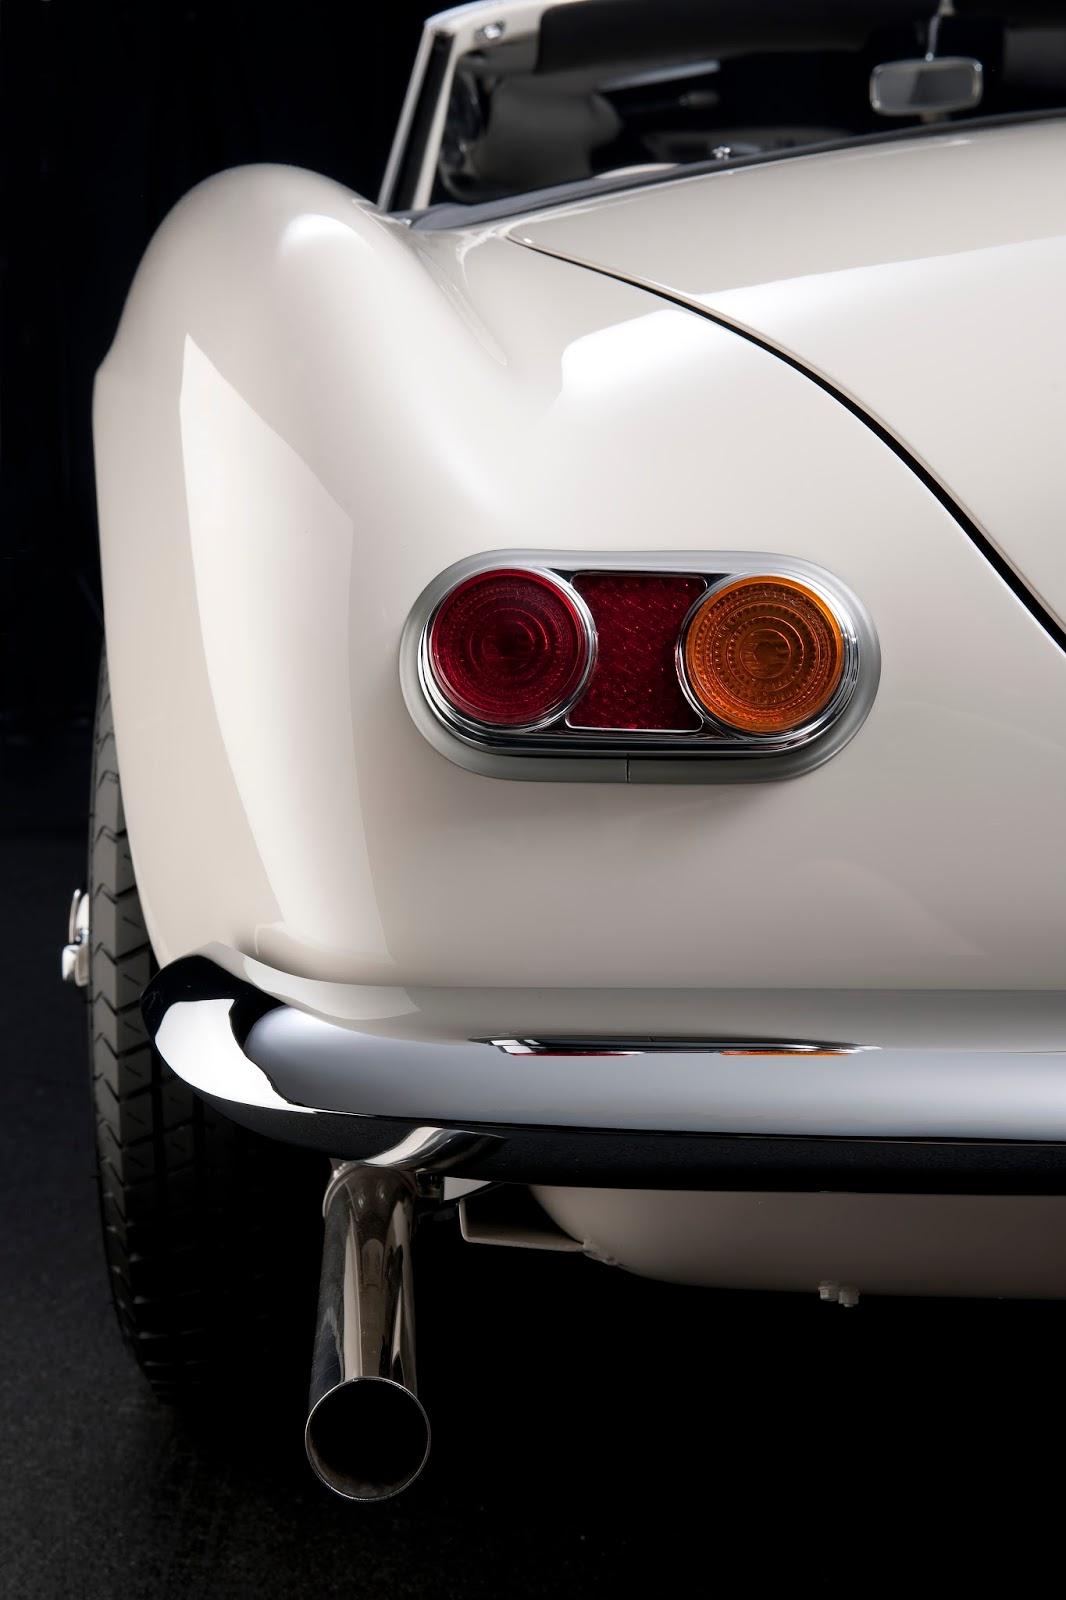 P90229731 highRes elvis bmw 507 08 201 Η επιστροφή της μυθικής BMW 507 του Elvis στο Concours d'Elegance, Pebble Beach autoshow, BMW, BMW 507, Classic, Concours d'Elegance, Roadster, zblog